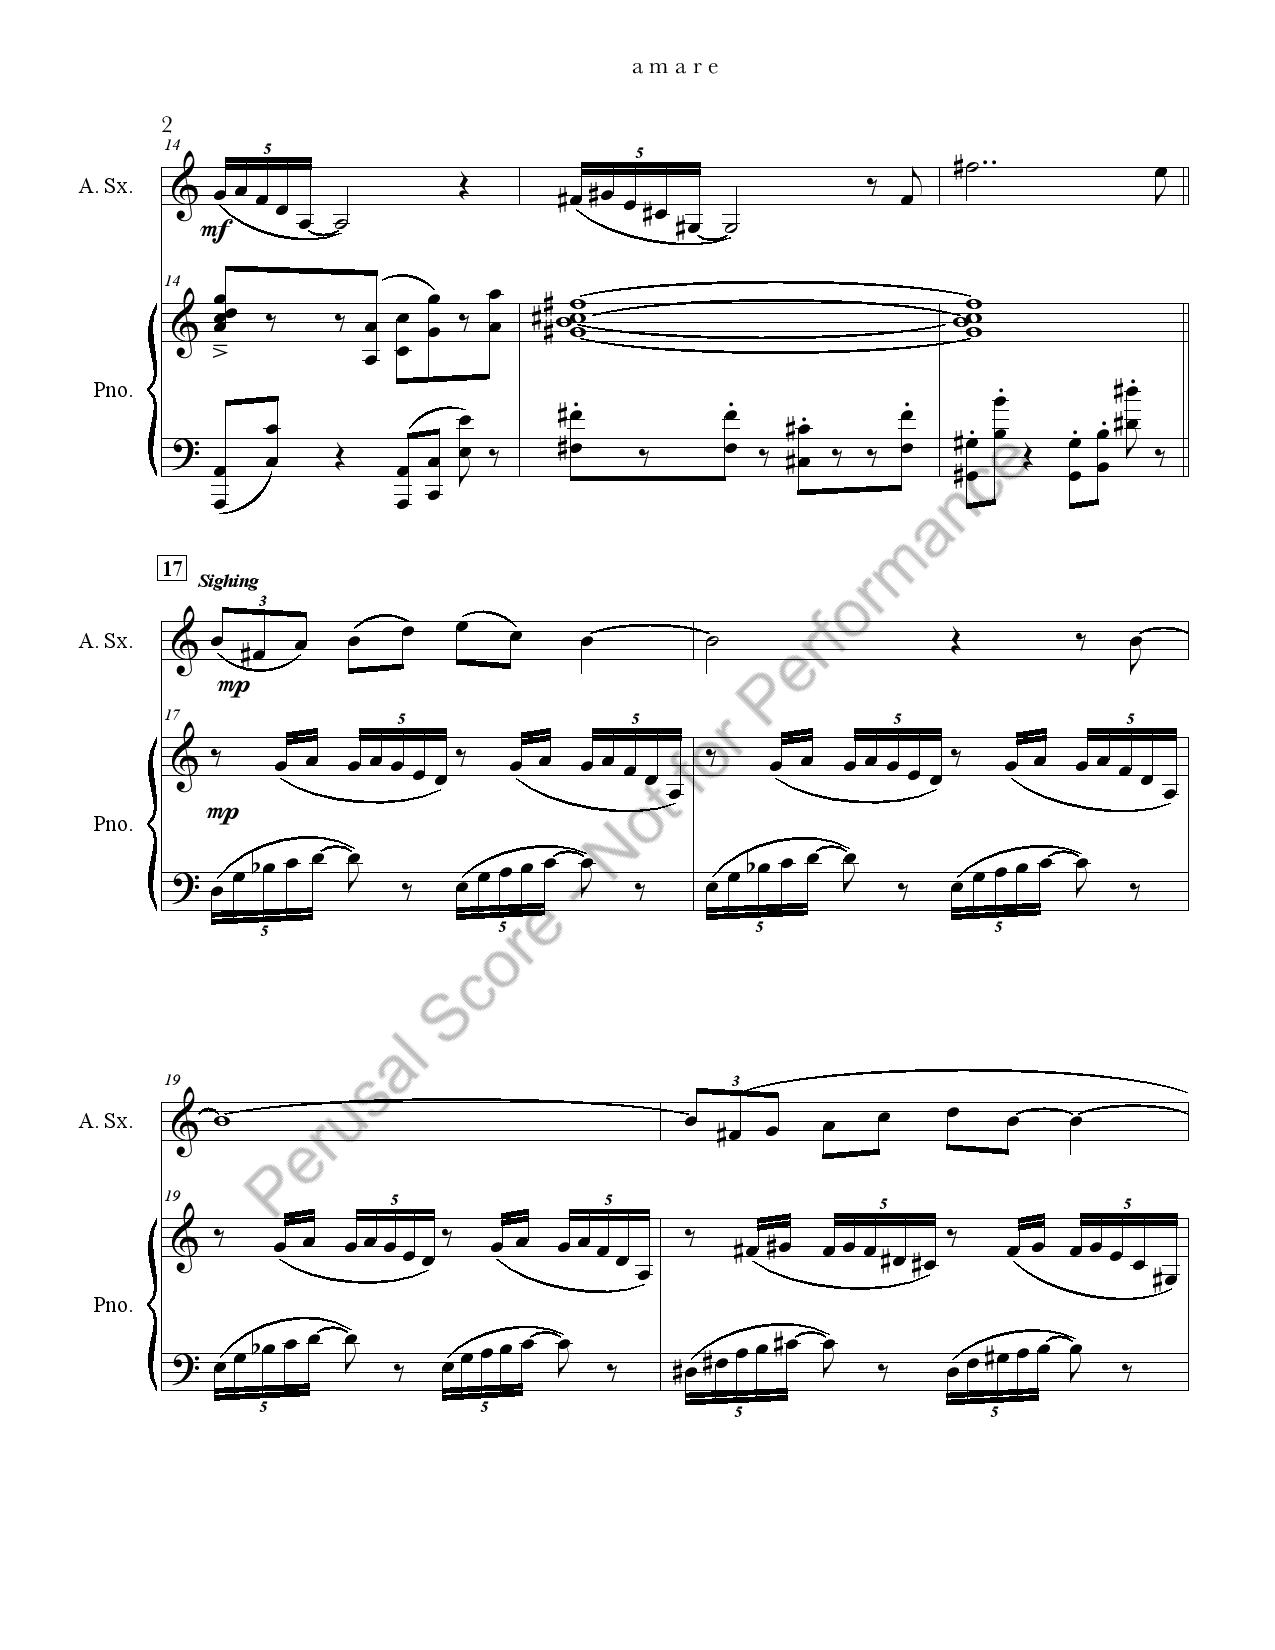 Boyd Amare Score_watermark-3-page-008.jpg